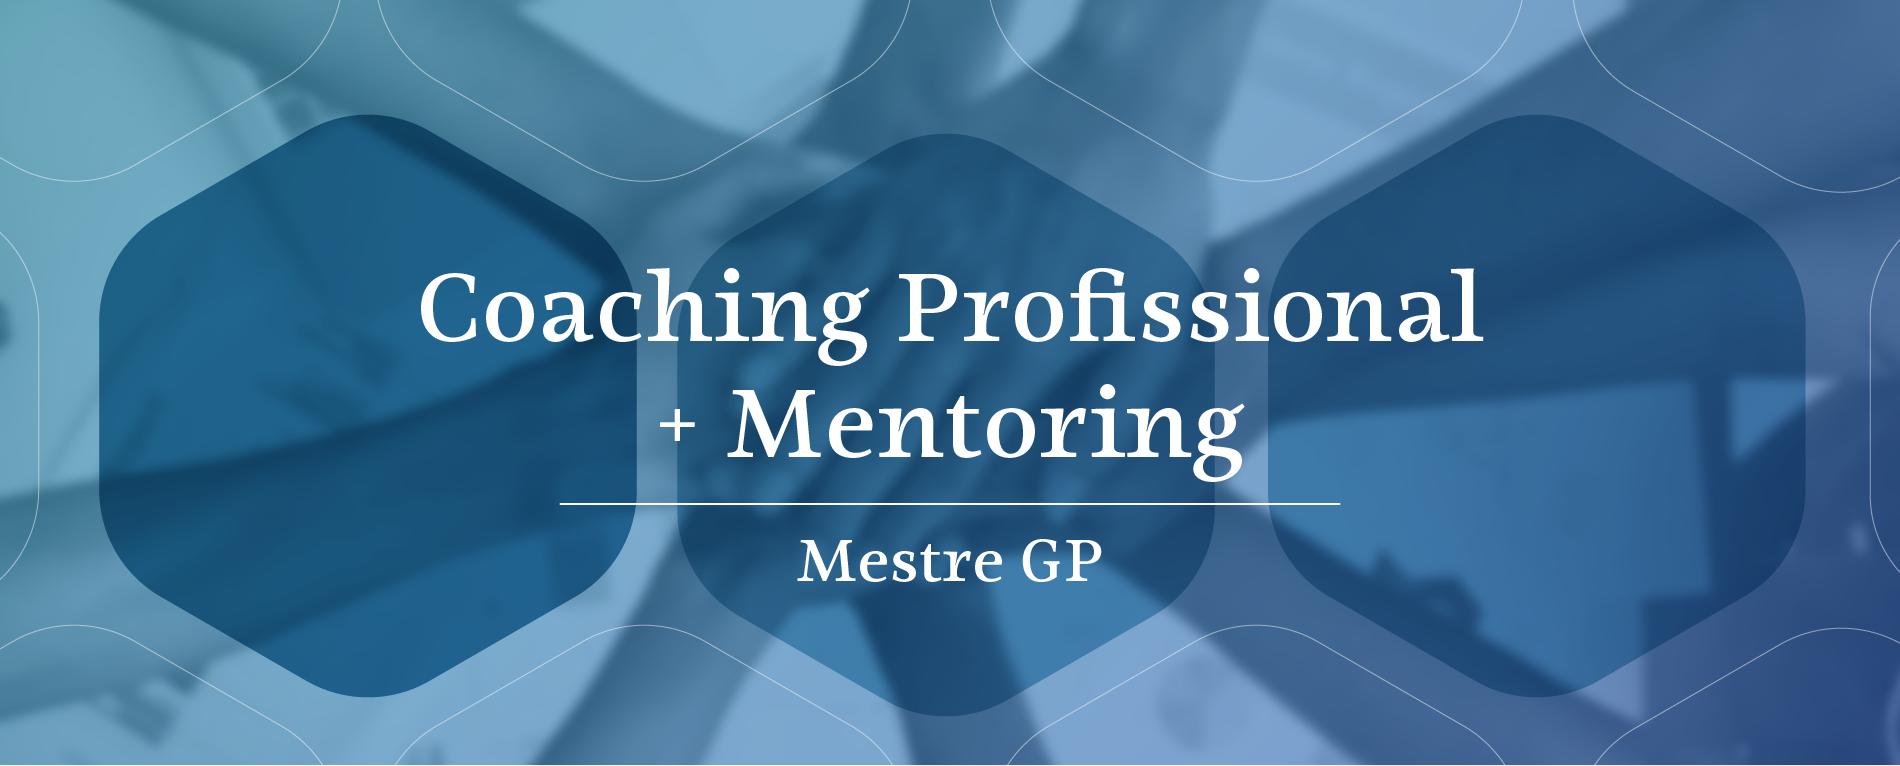 https://www.mestregp.com.br/wp-content/uploads/2016/10/CoachingMentoring_MGP-slice-01-1900x766.png